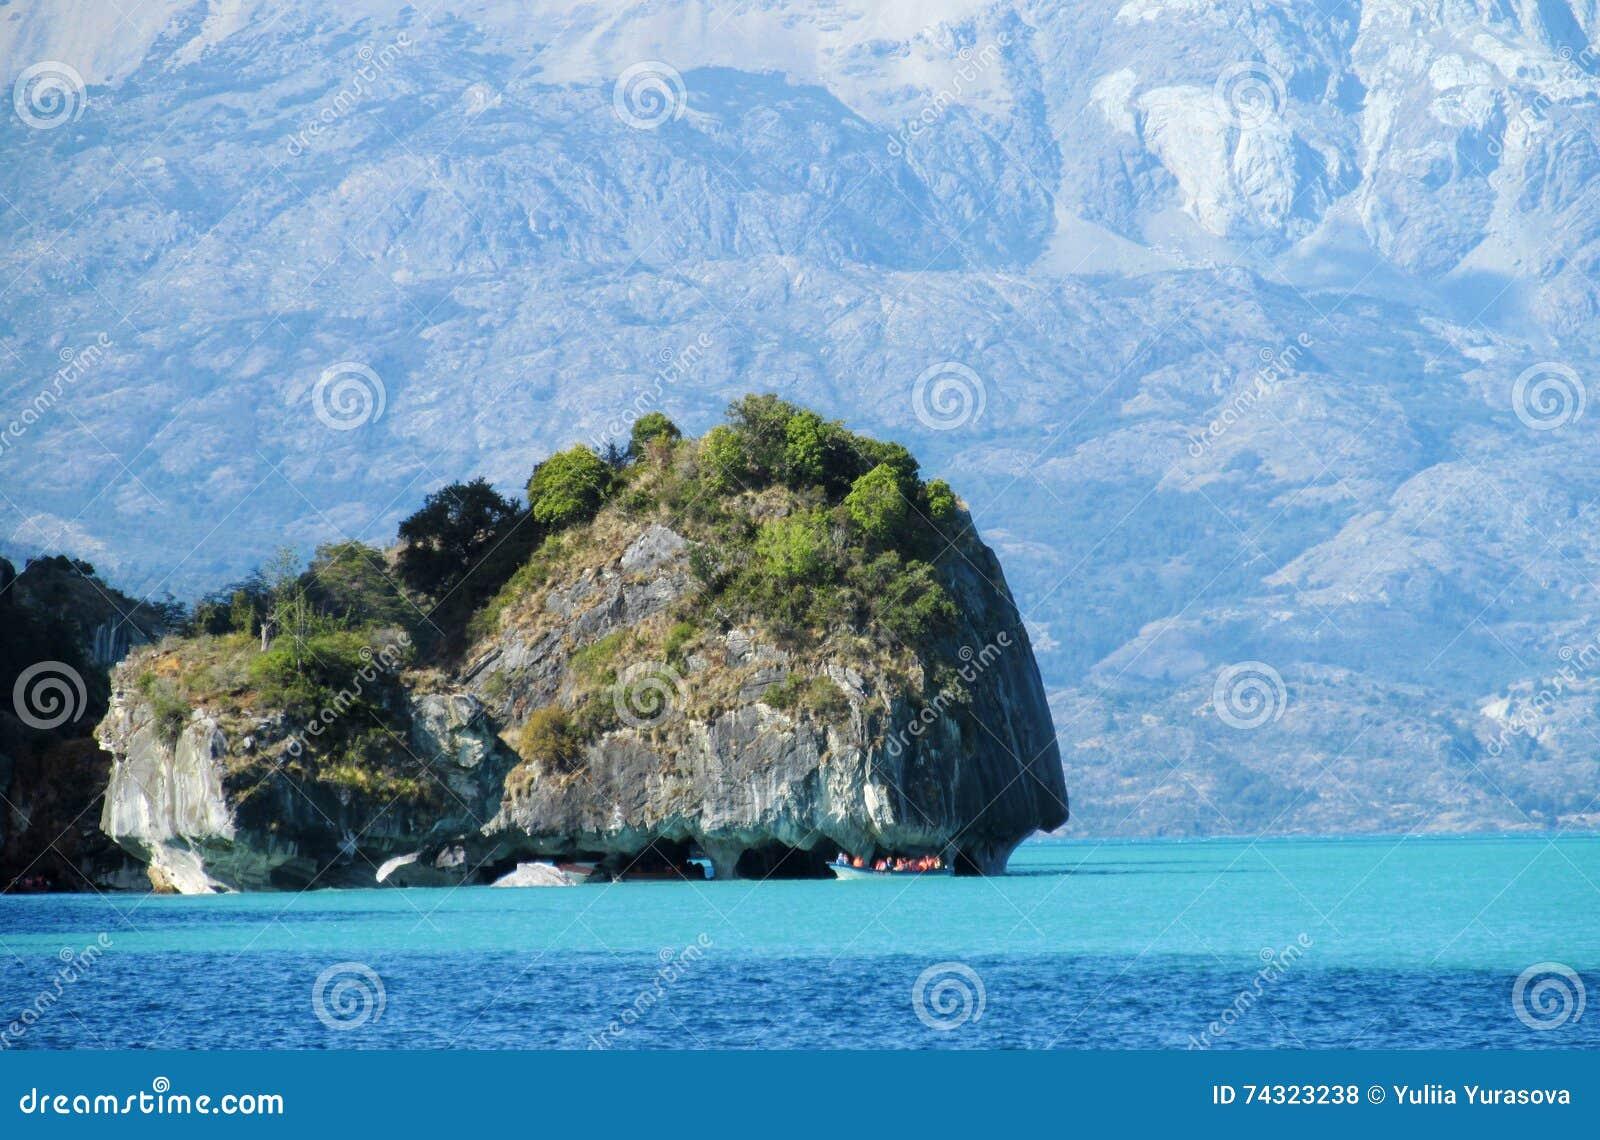 Marble Cave island, Capillas de Marmol island in Chile